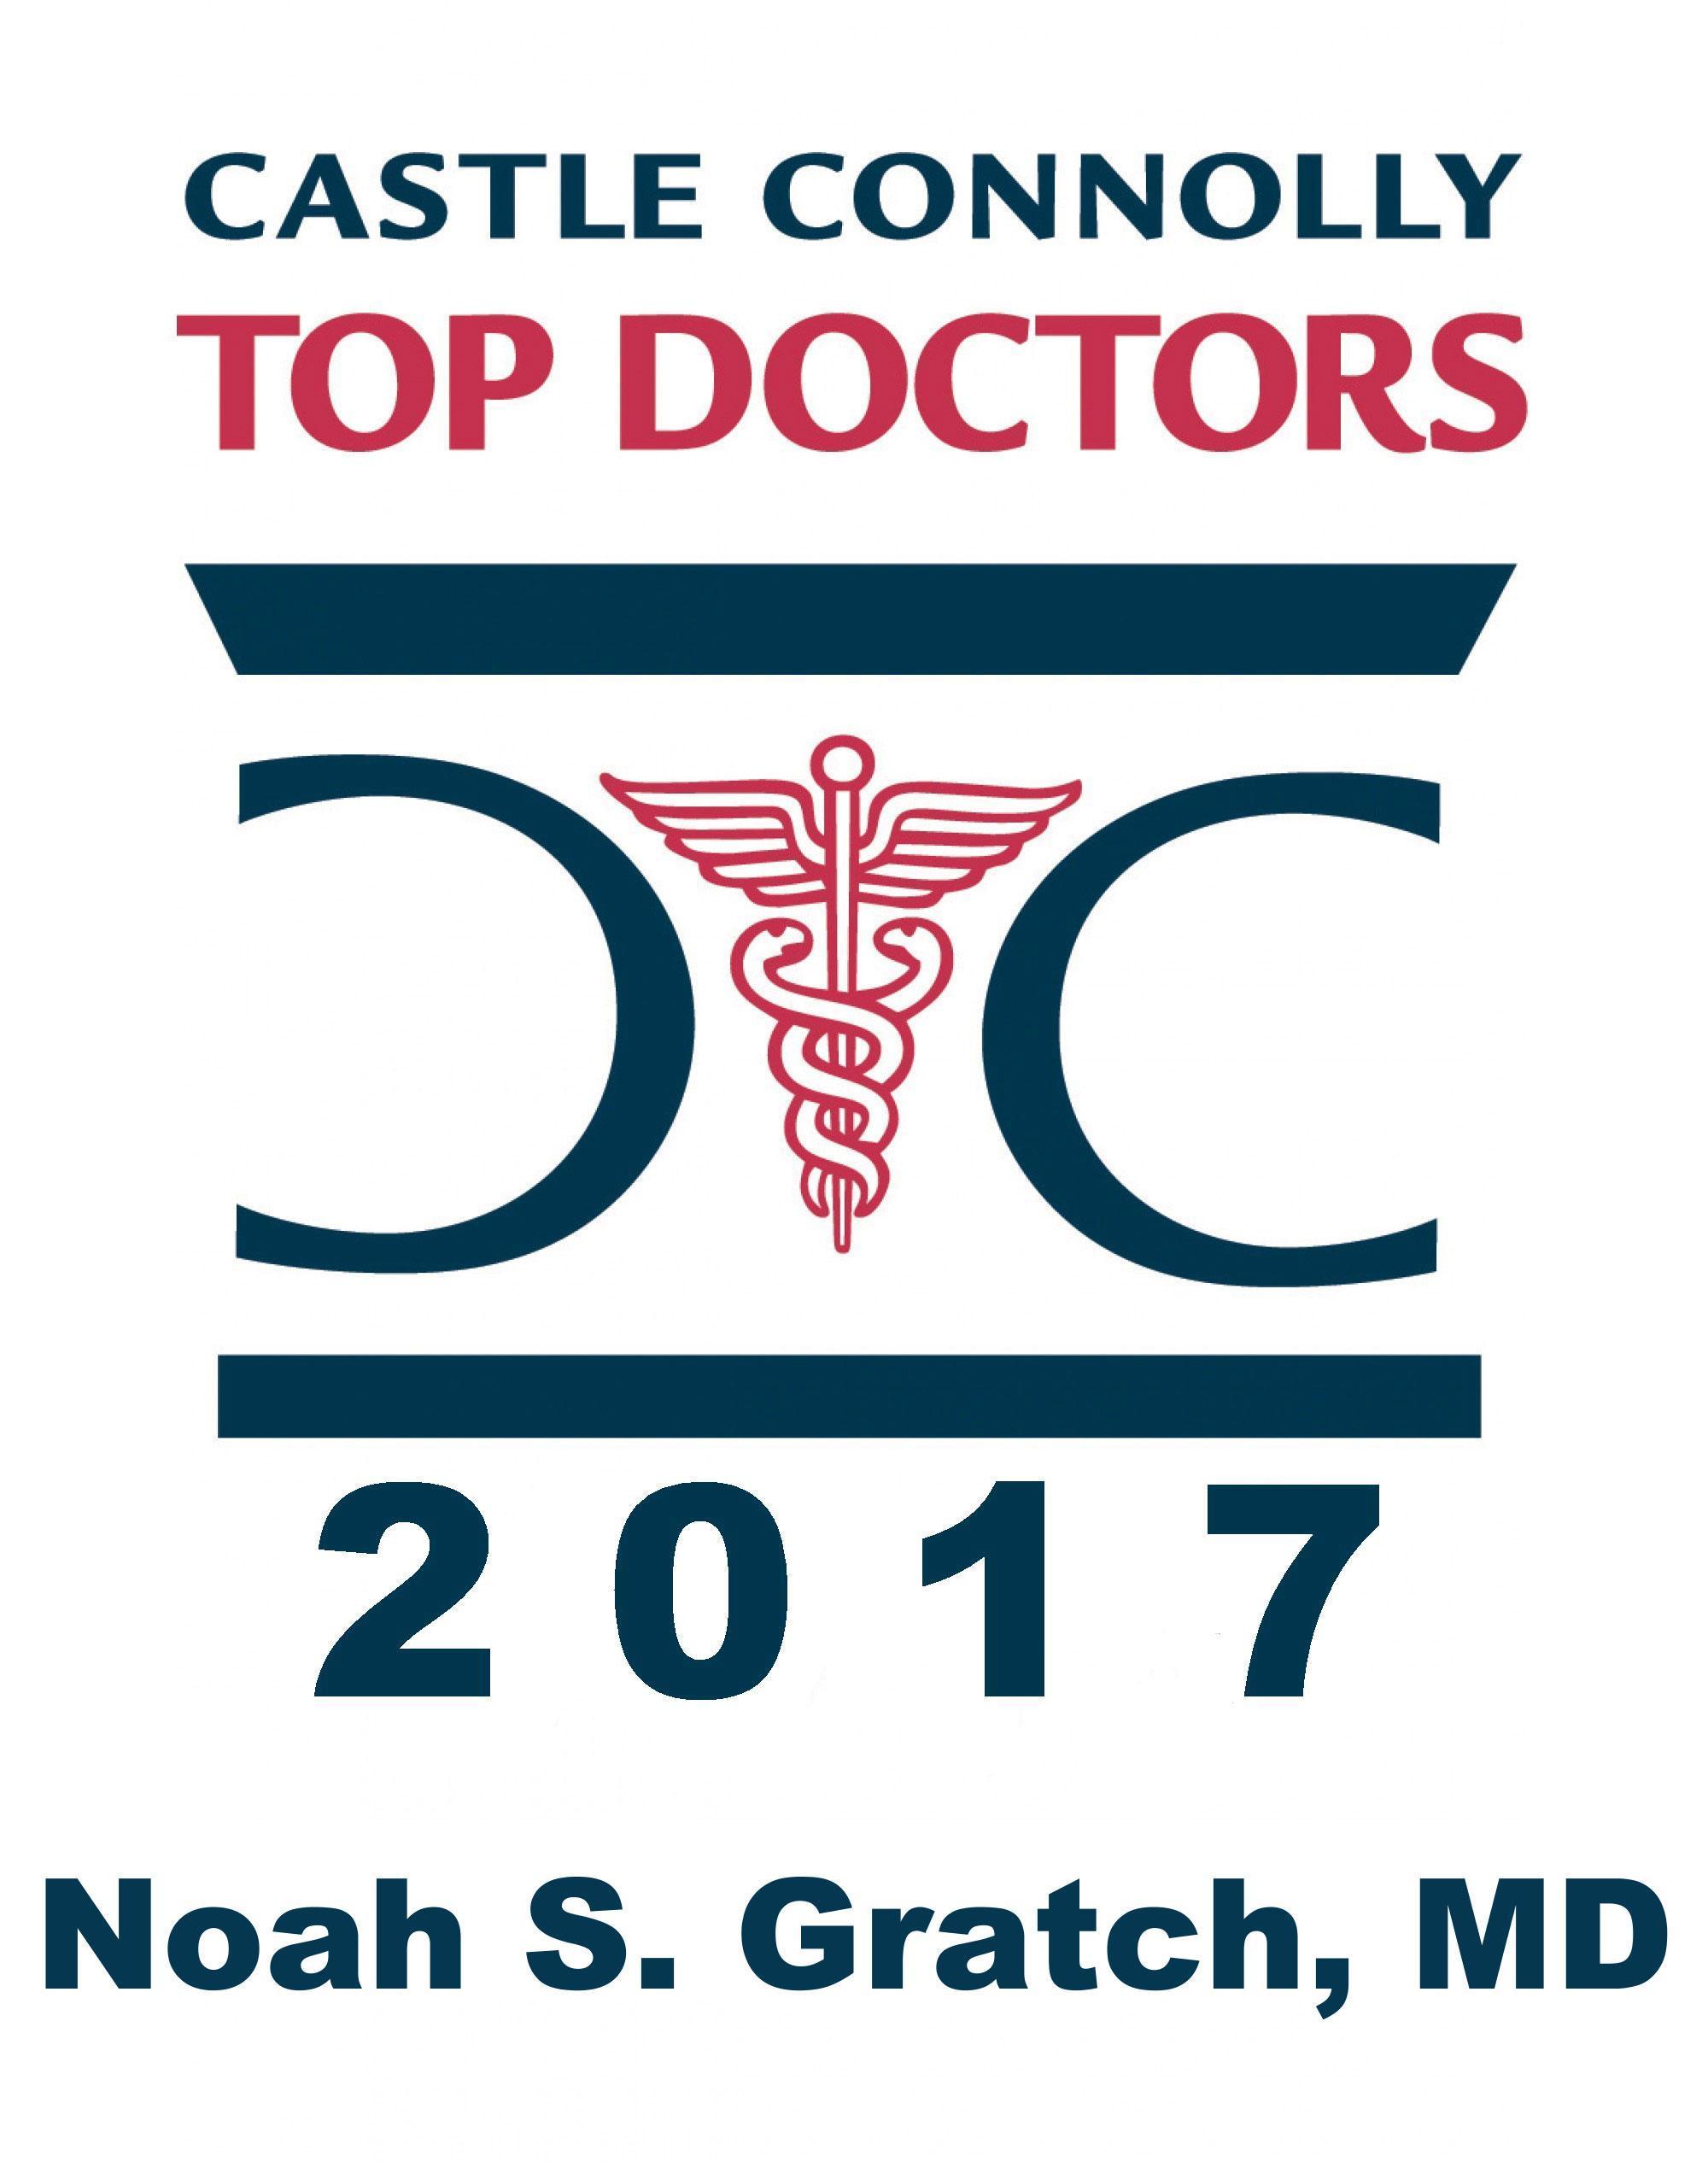 Noah Gratch, MD: Dermatologist Midtown East New York, NY & Commack, NY